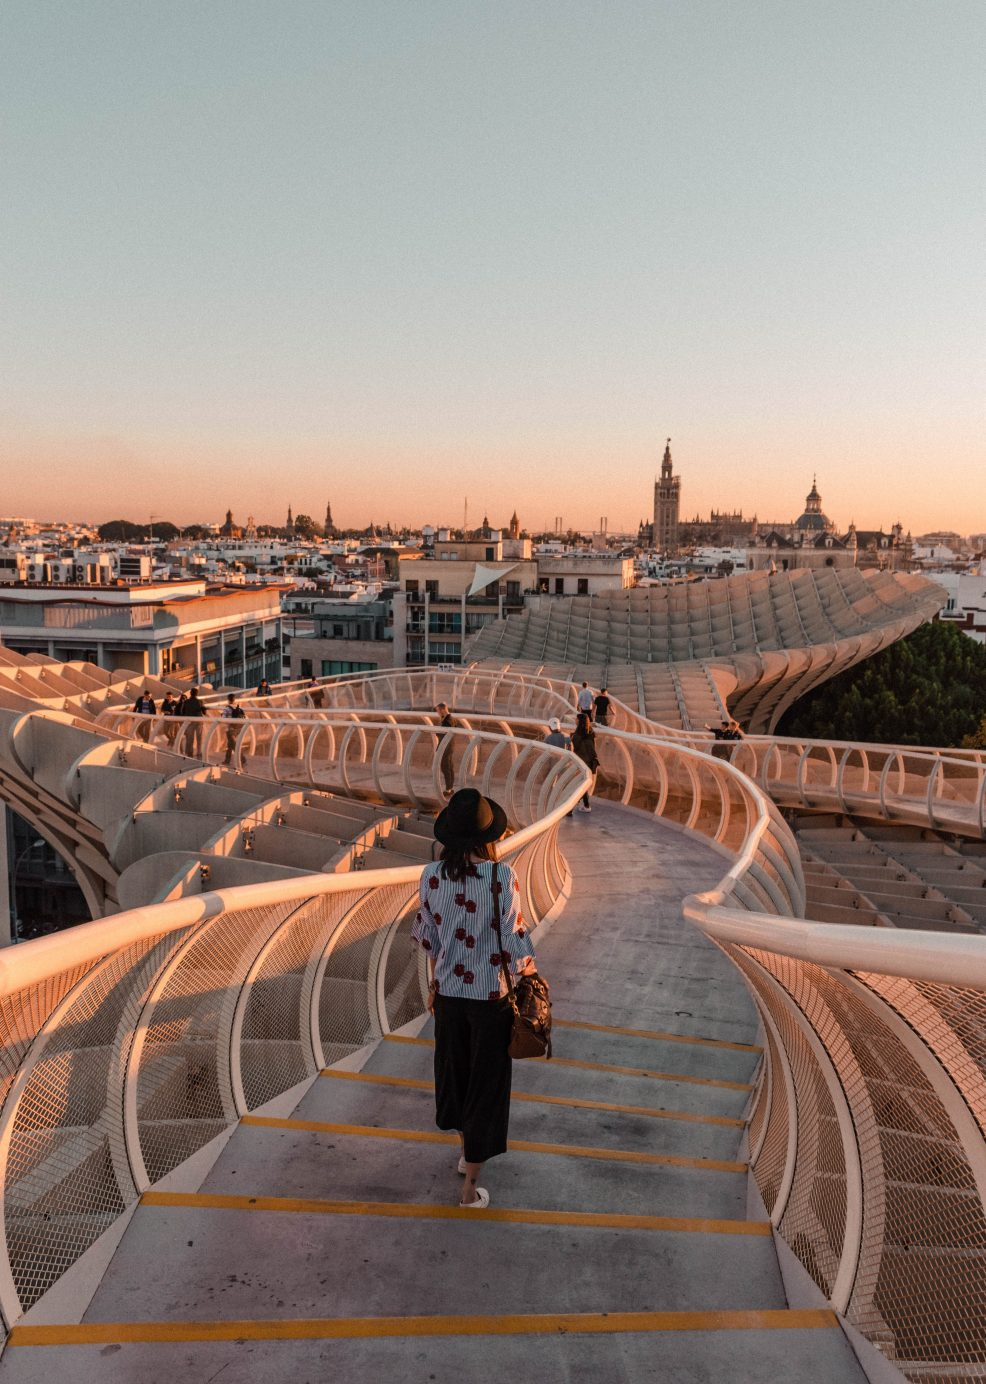 Views of Sevilla from the Metropol Parasol at sunset